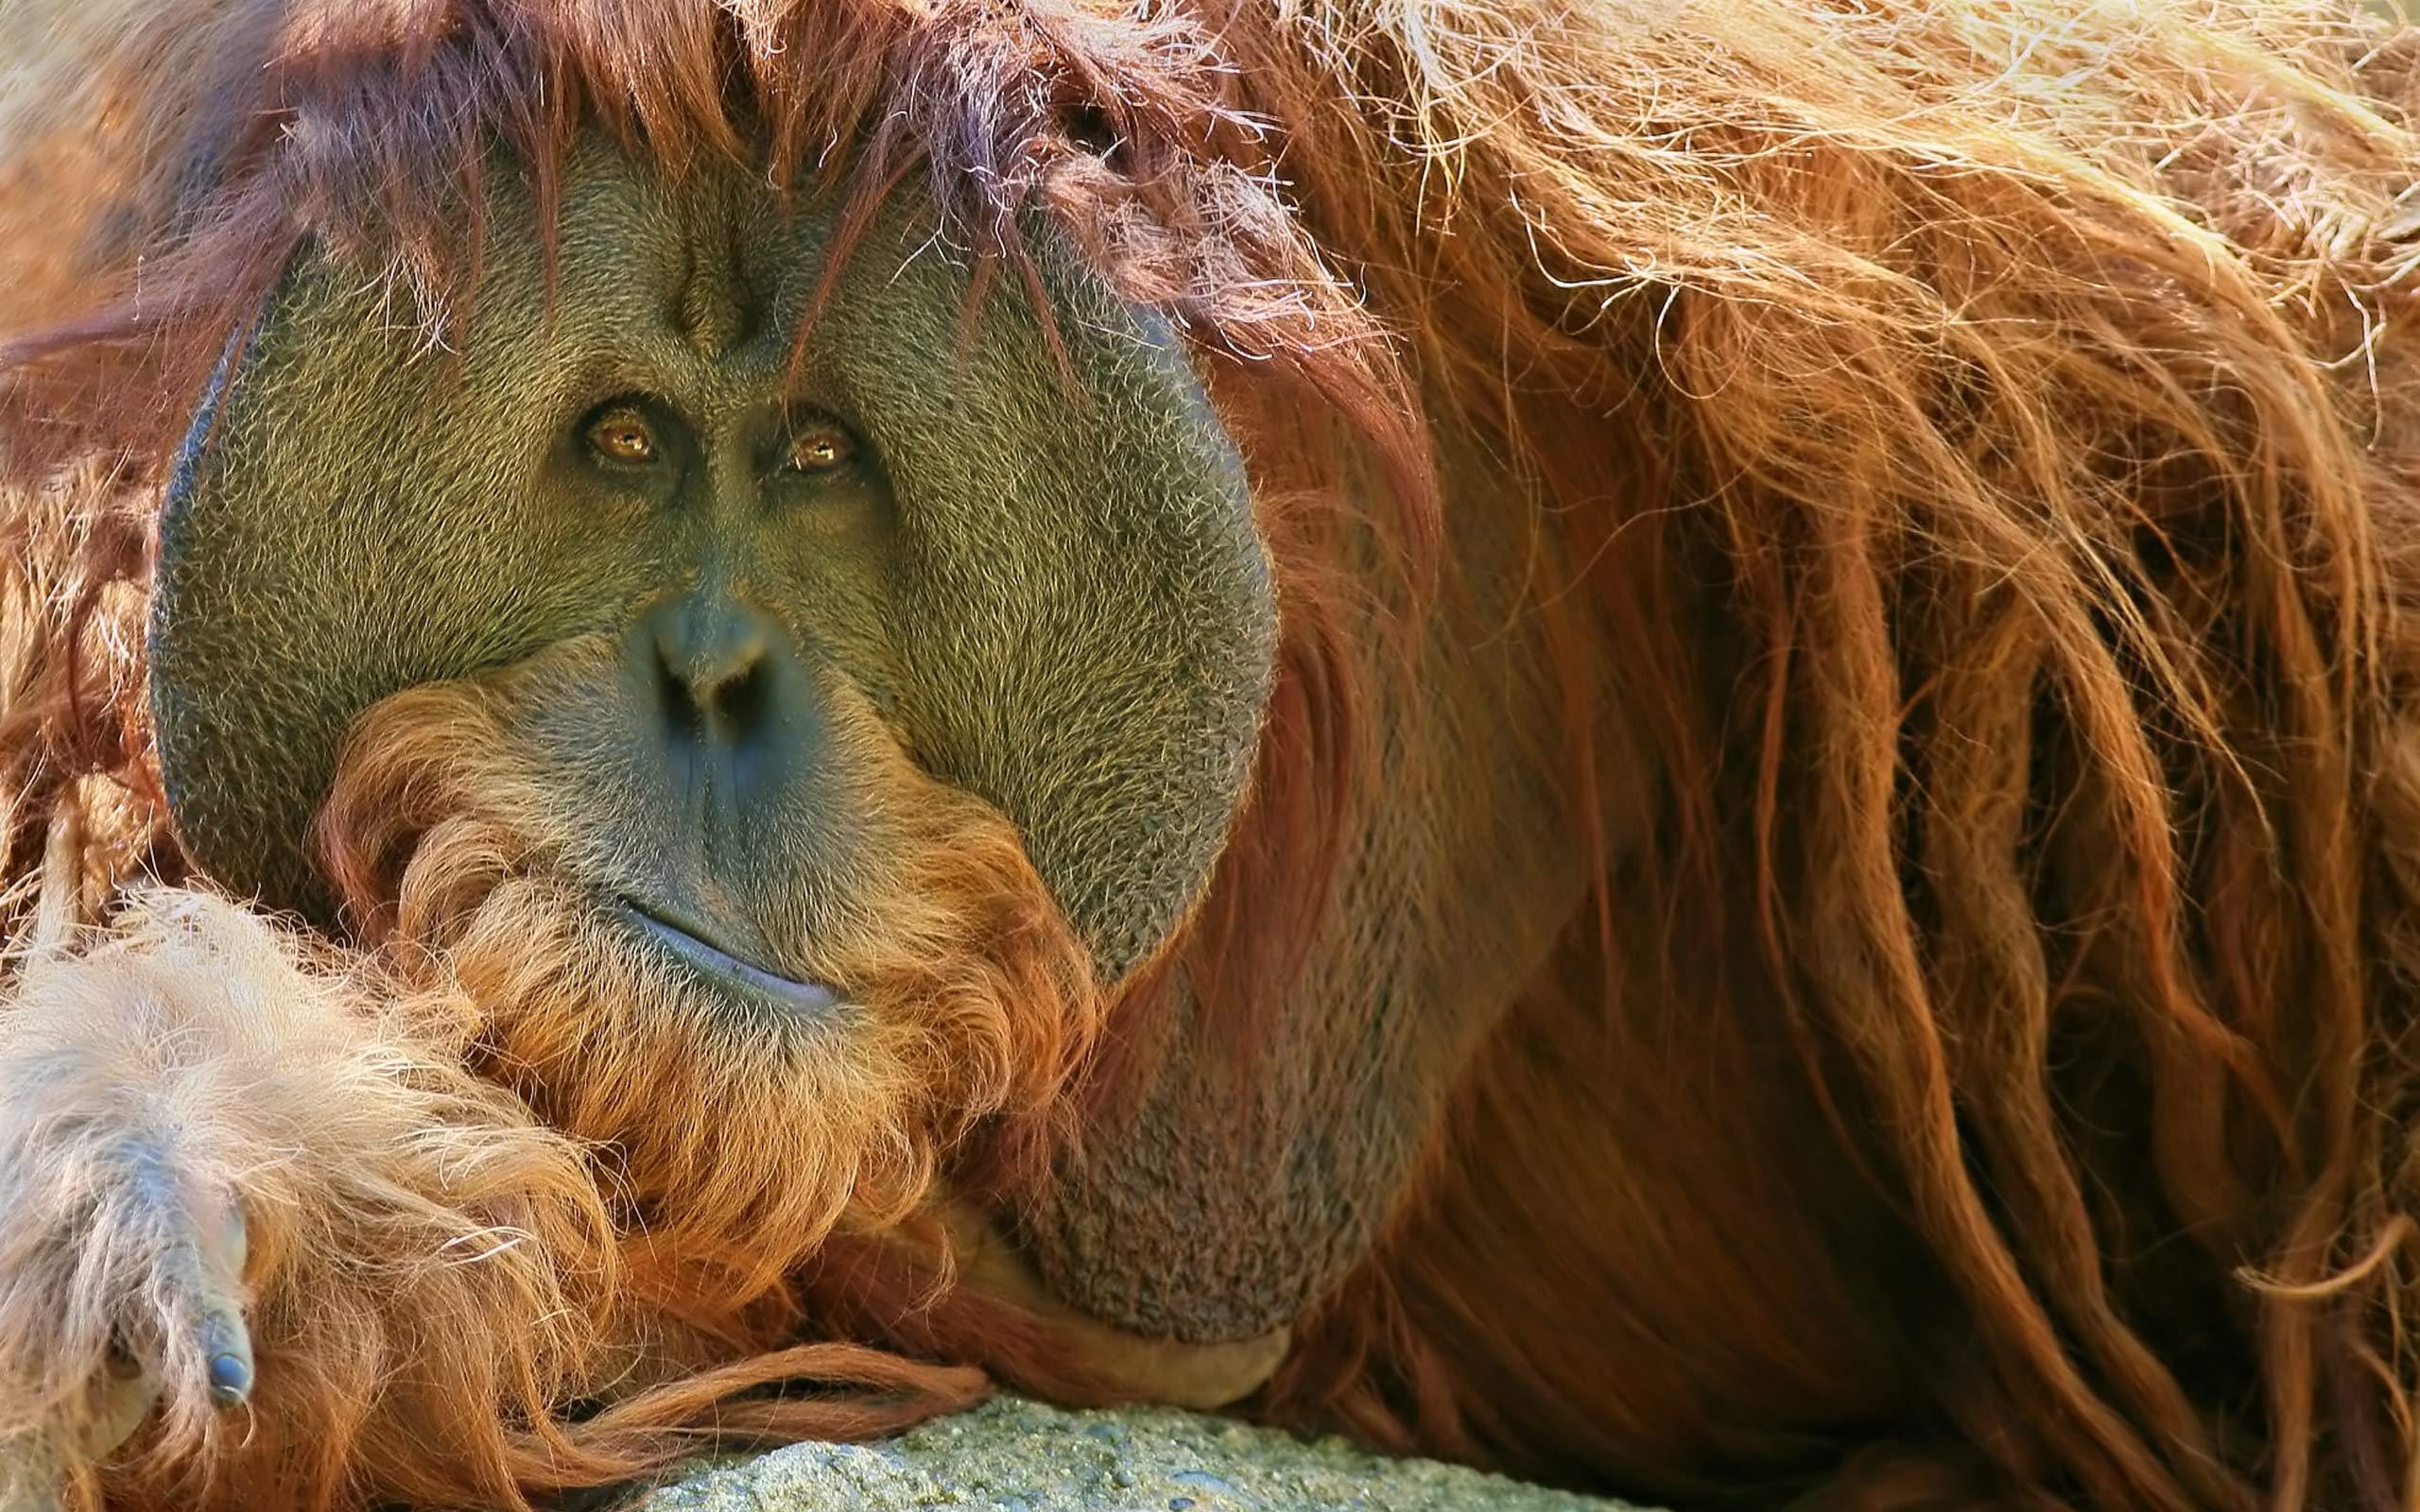 Orangutan Hd Wallpaper Background Image 2560x1600 Id110649